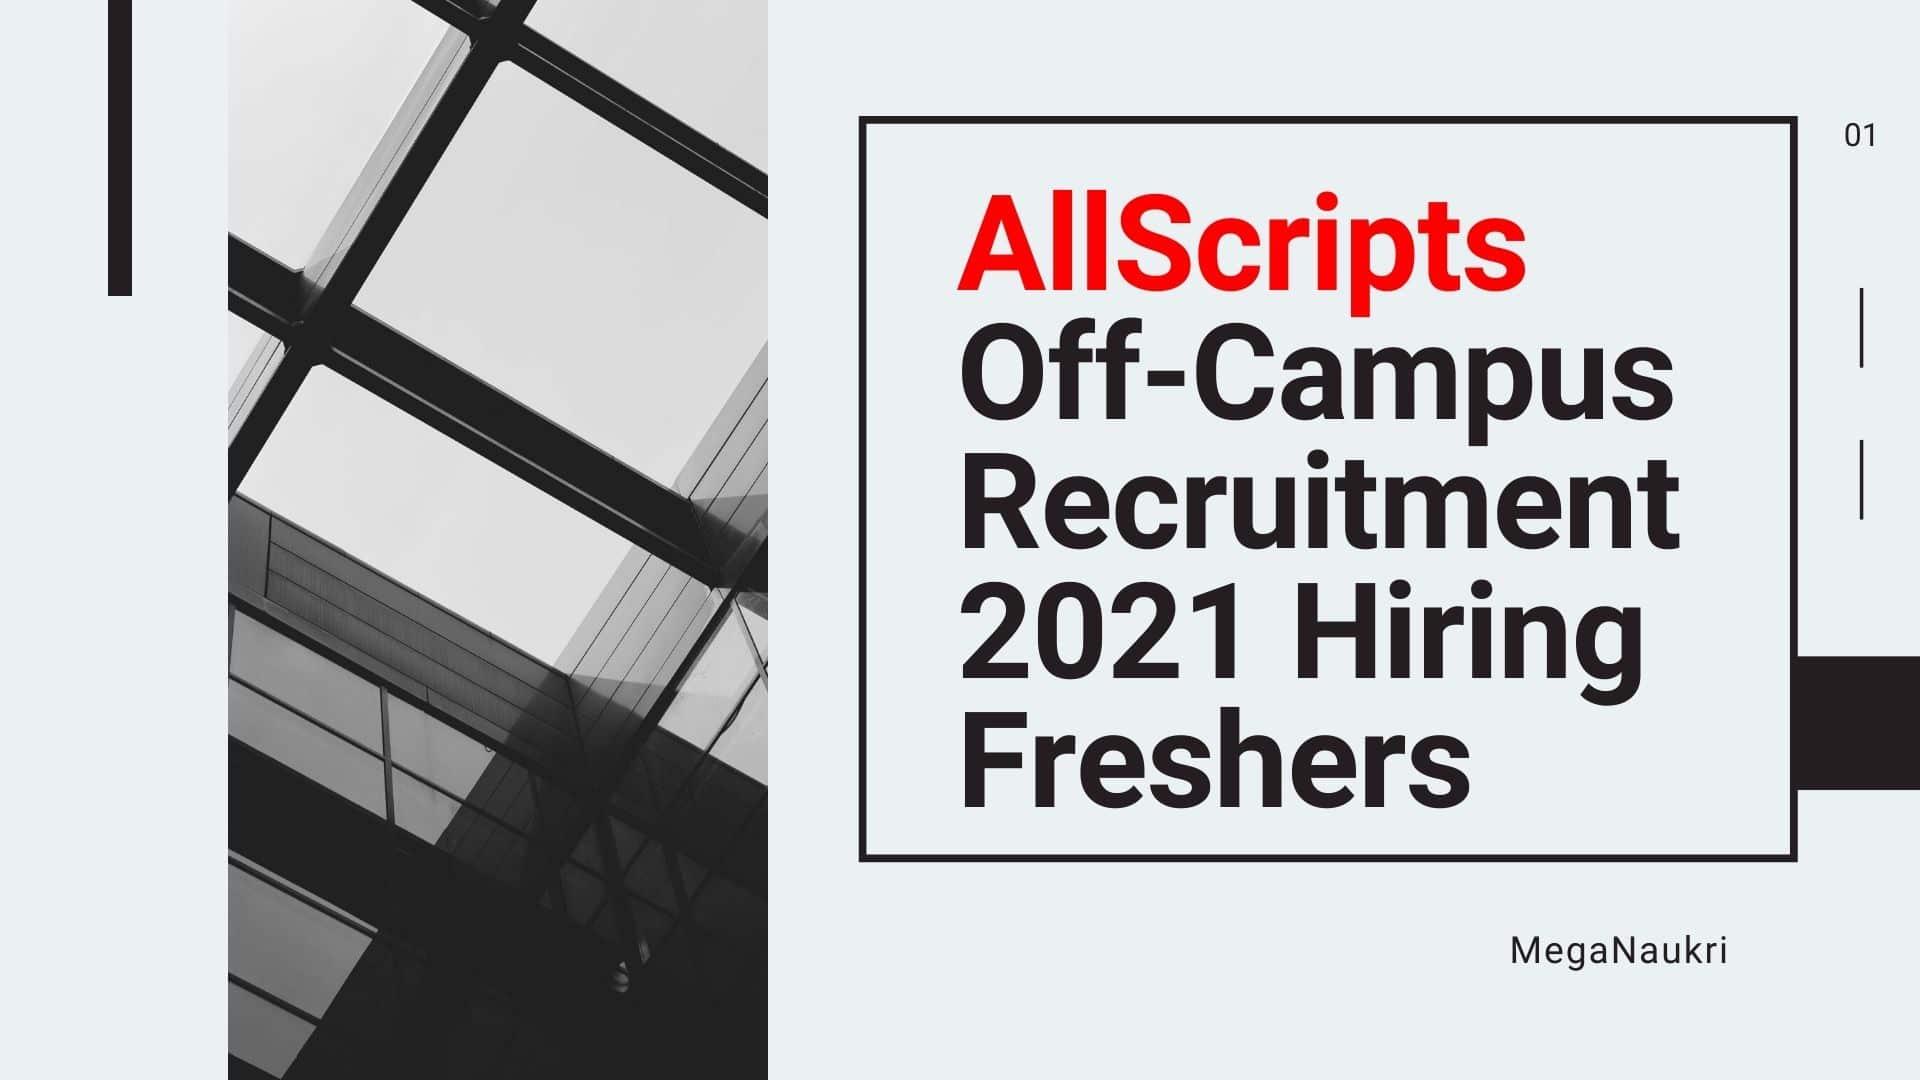 AllScripts-Off-Campus-Recruitment-2021